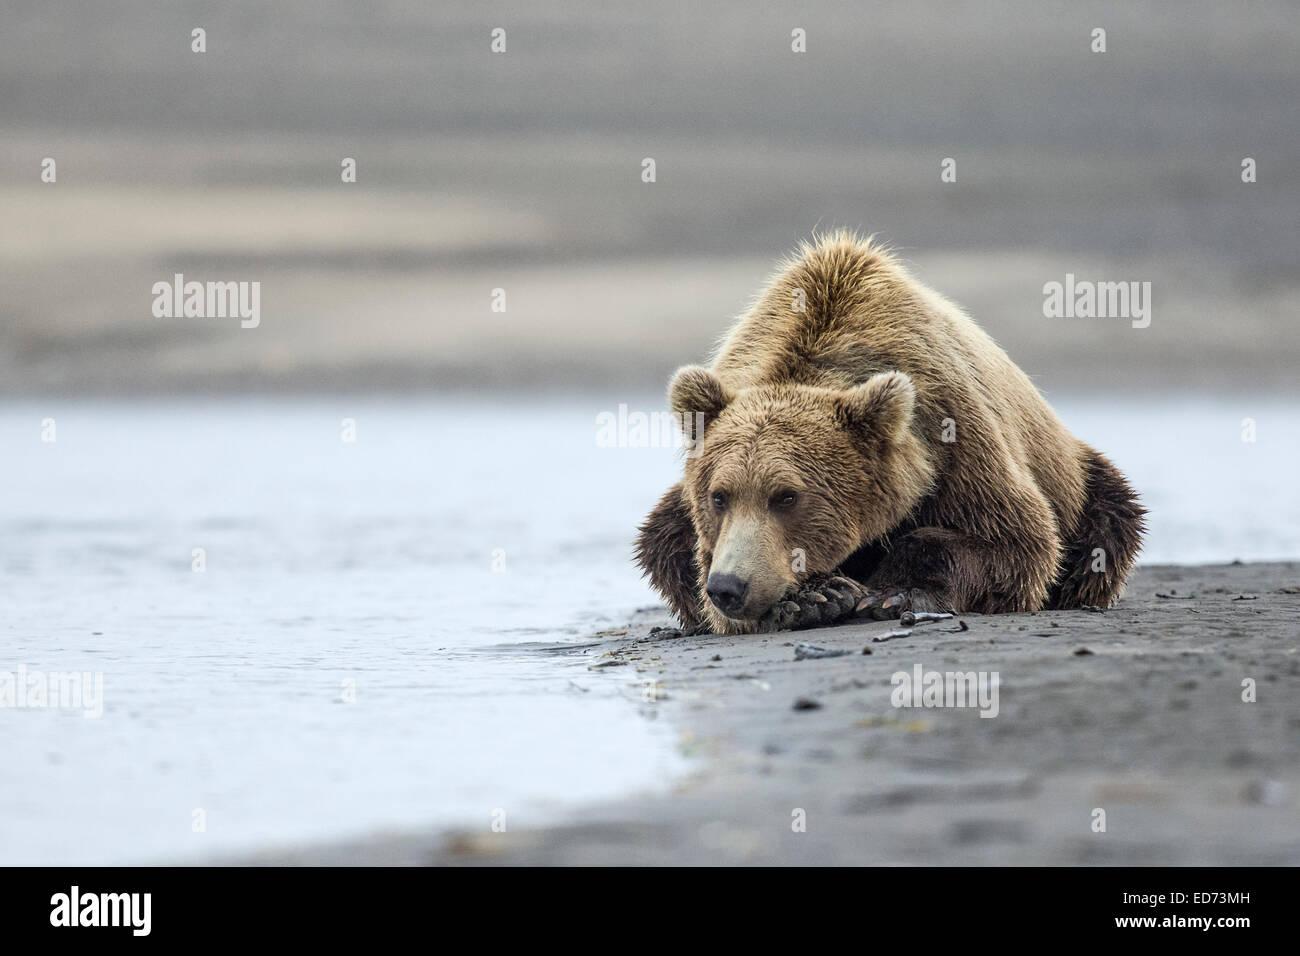 A coastal brown bear waits patiently for salmon beside a tidal pool at Lake Clark NP, Alaska - Stock Image